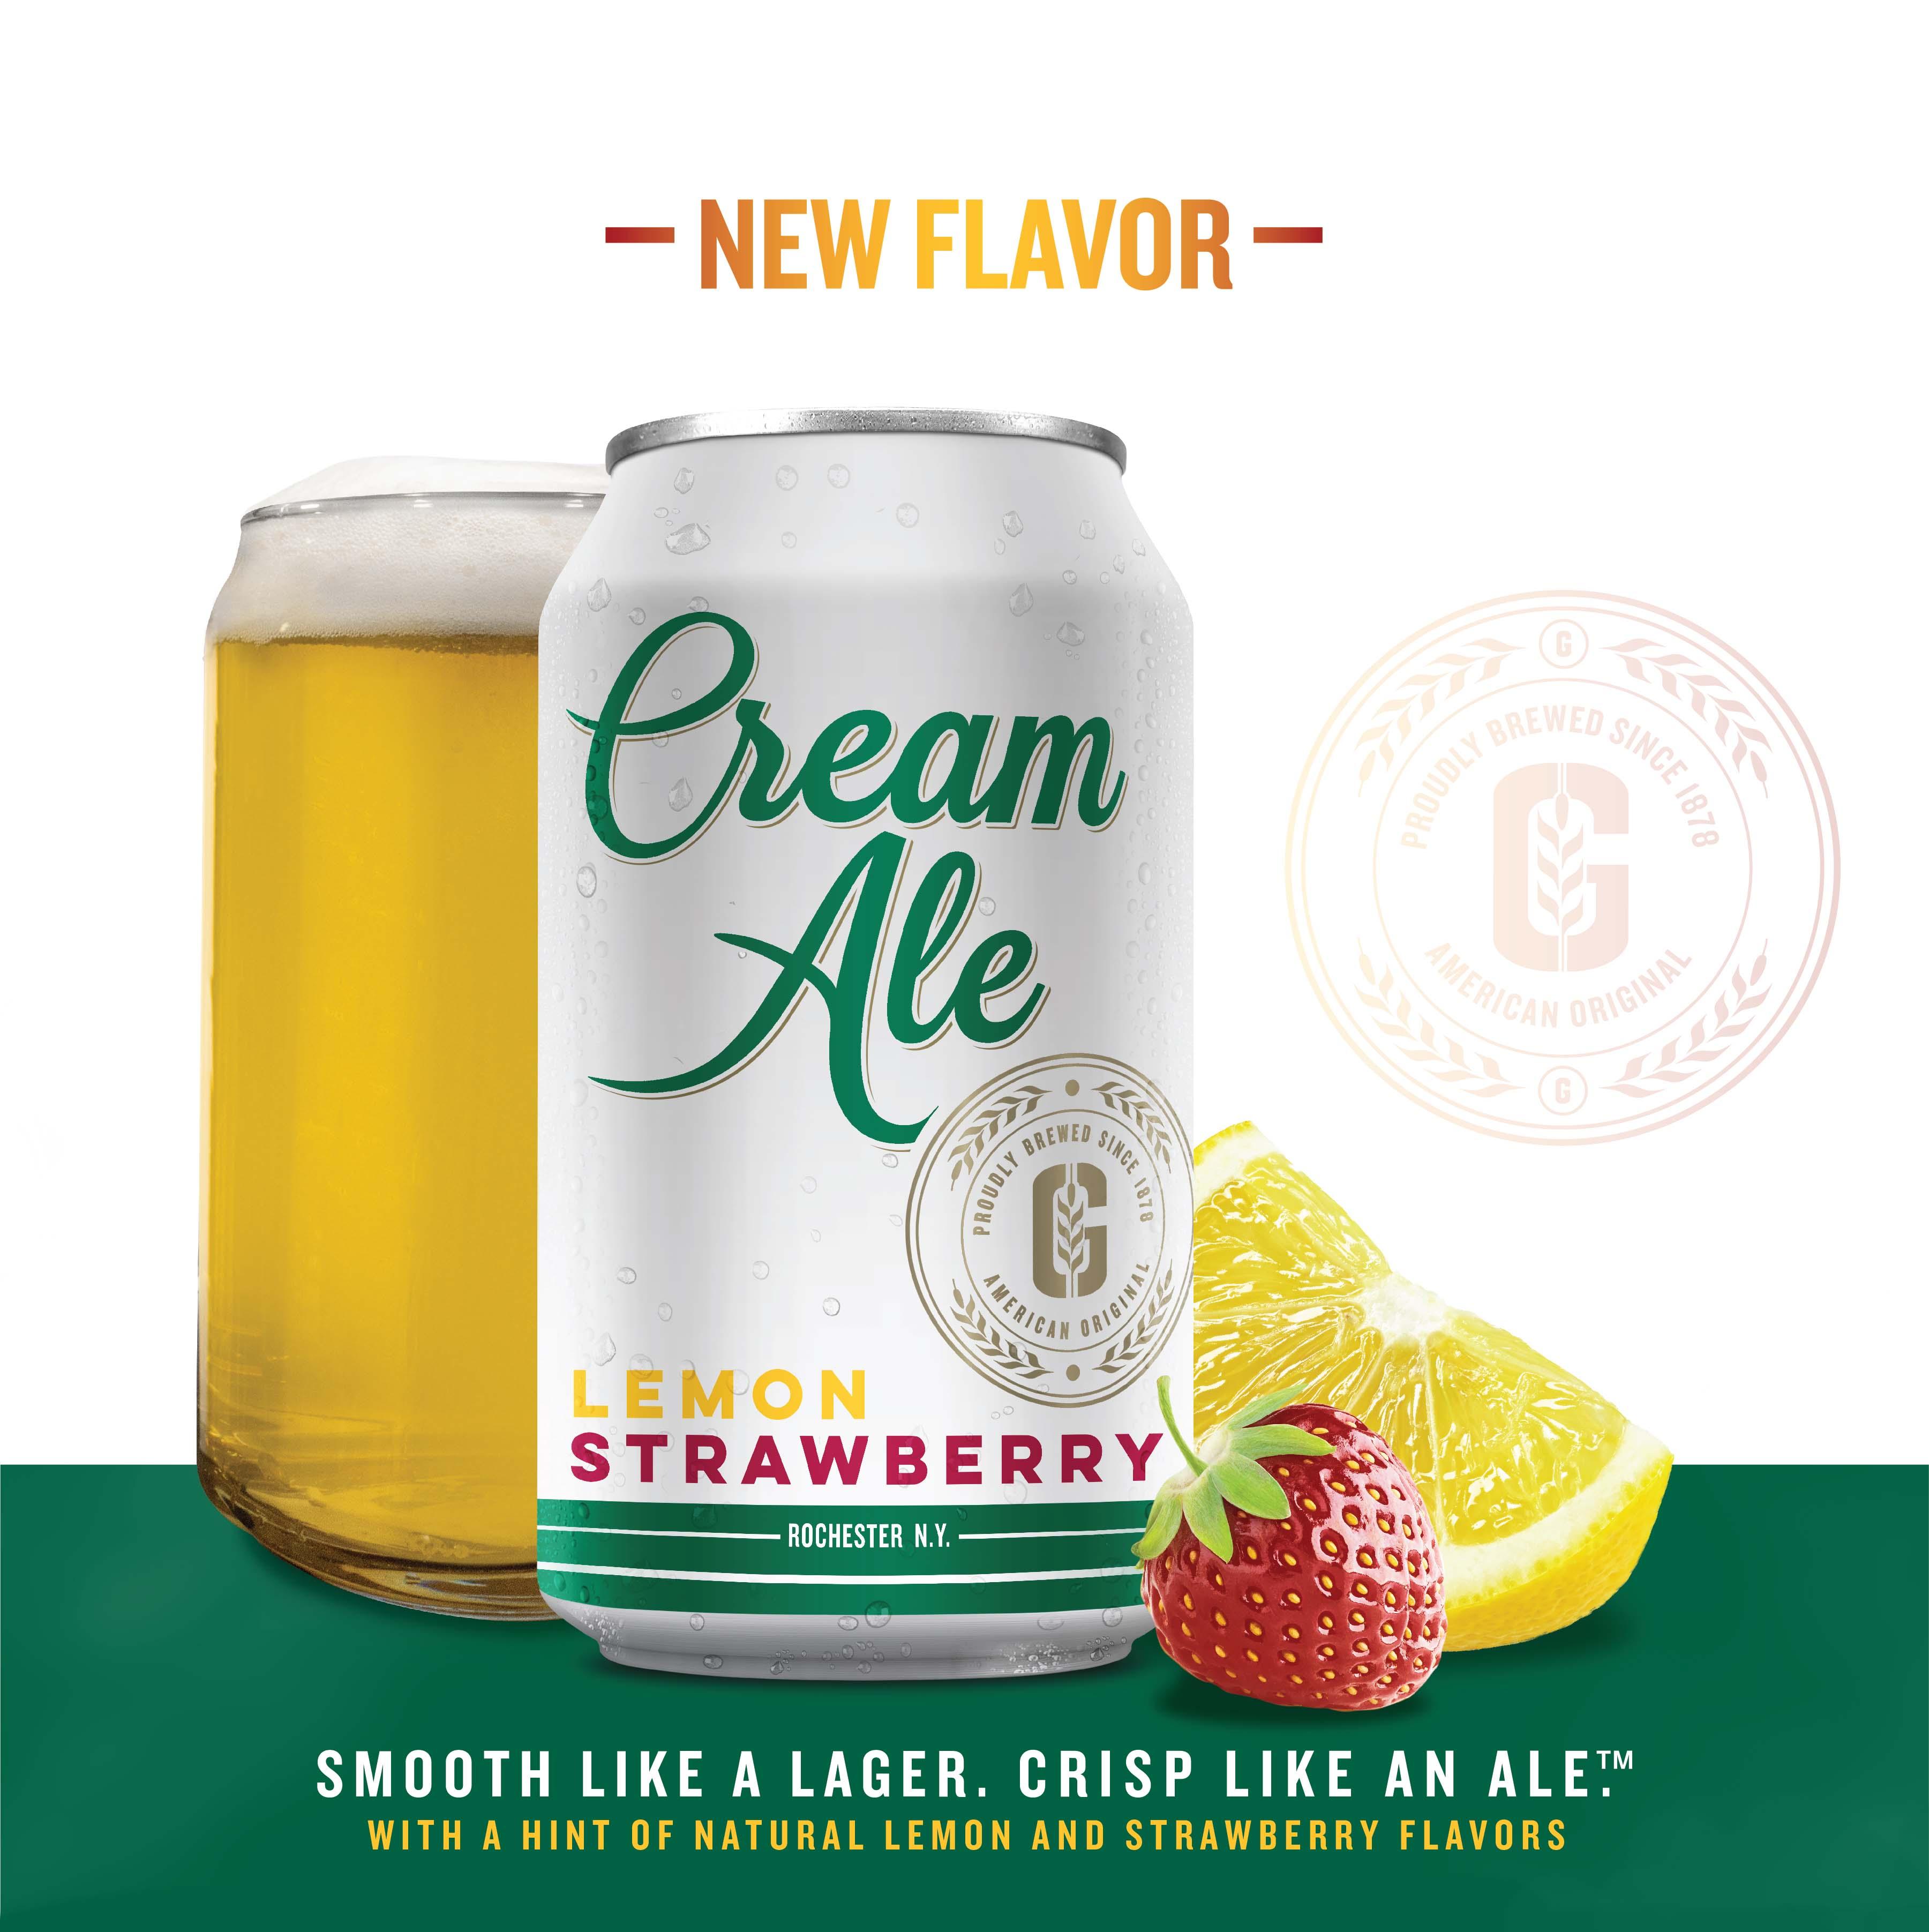 Lemon Strawberry Cream Ale